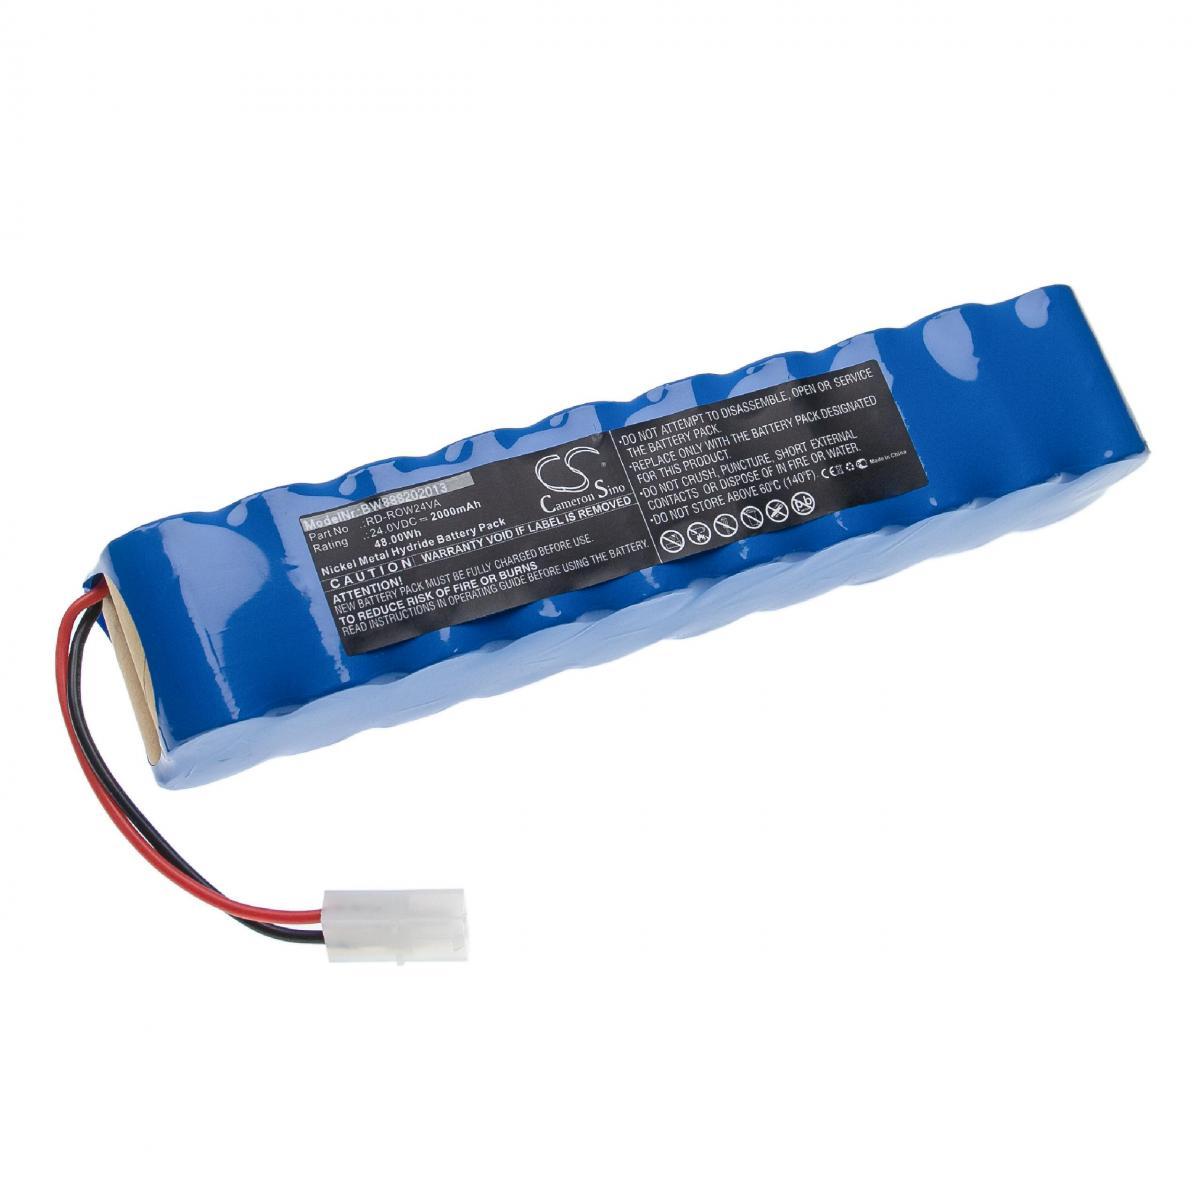 Vhbw vhbw batterie compatible avec Rowenta Air Force Extreme RH8872WO/9A0, RH8872WO/9A2 aspirateur Home Cleaner (2000mAh, 24V